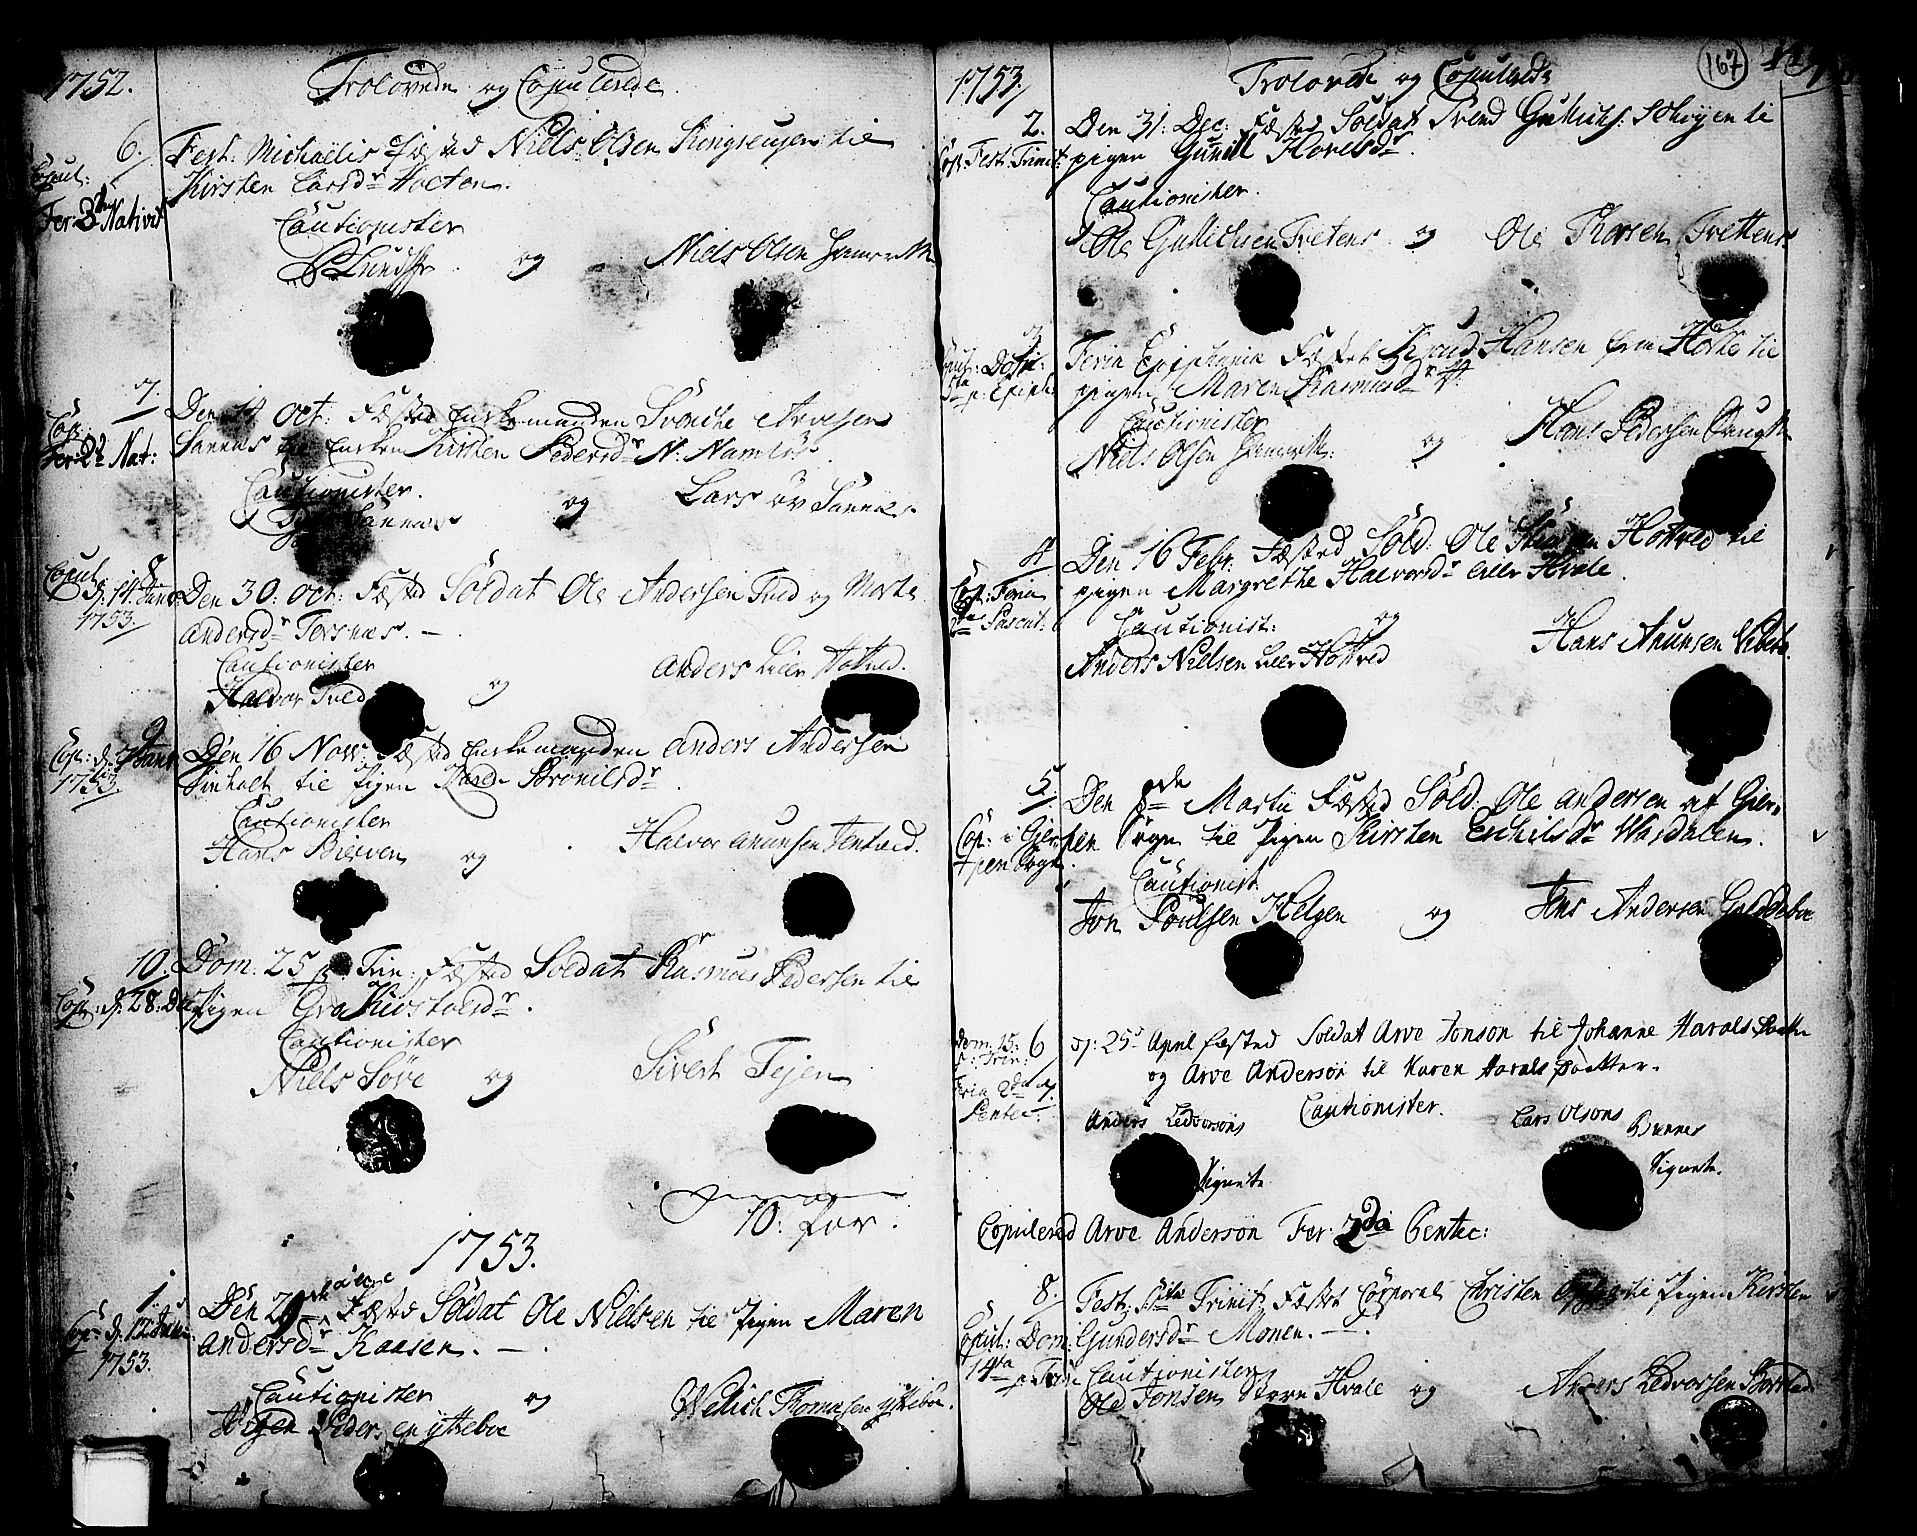 SAKO, Holla kirkebøker, F/Fa/L0001: Ministerialbok nr. 1, 1717-1779, s. 167